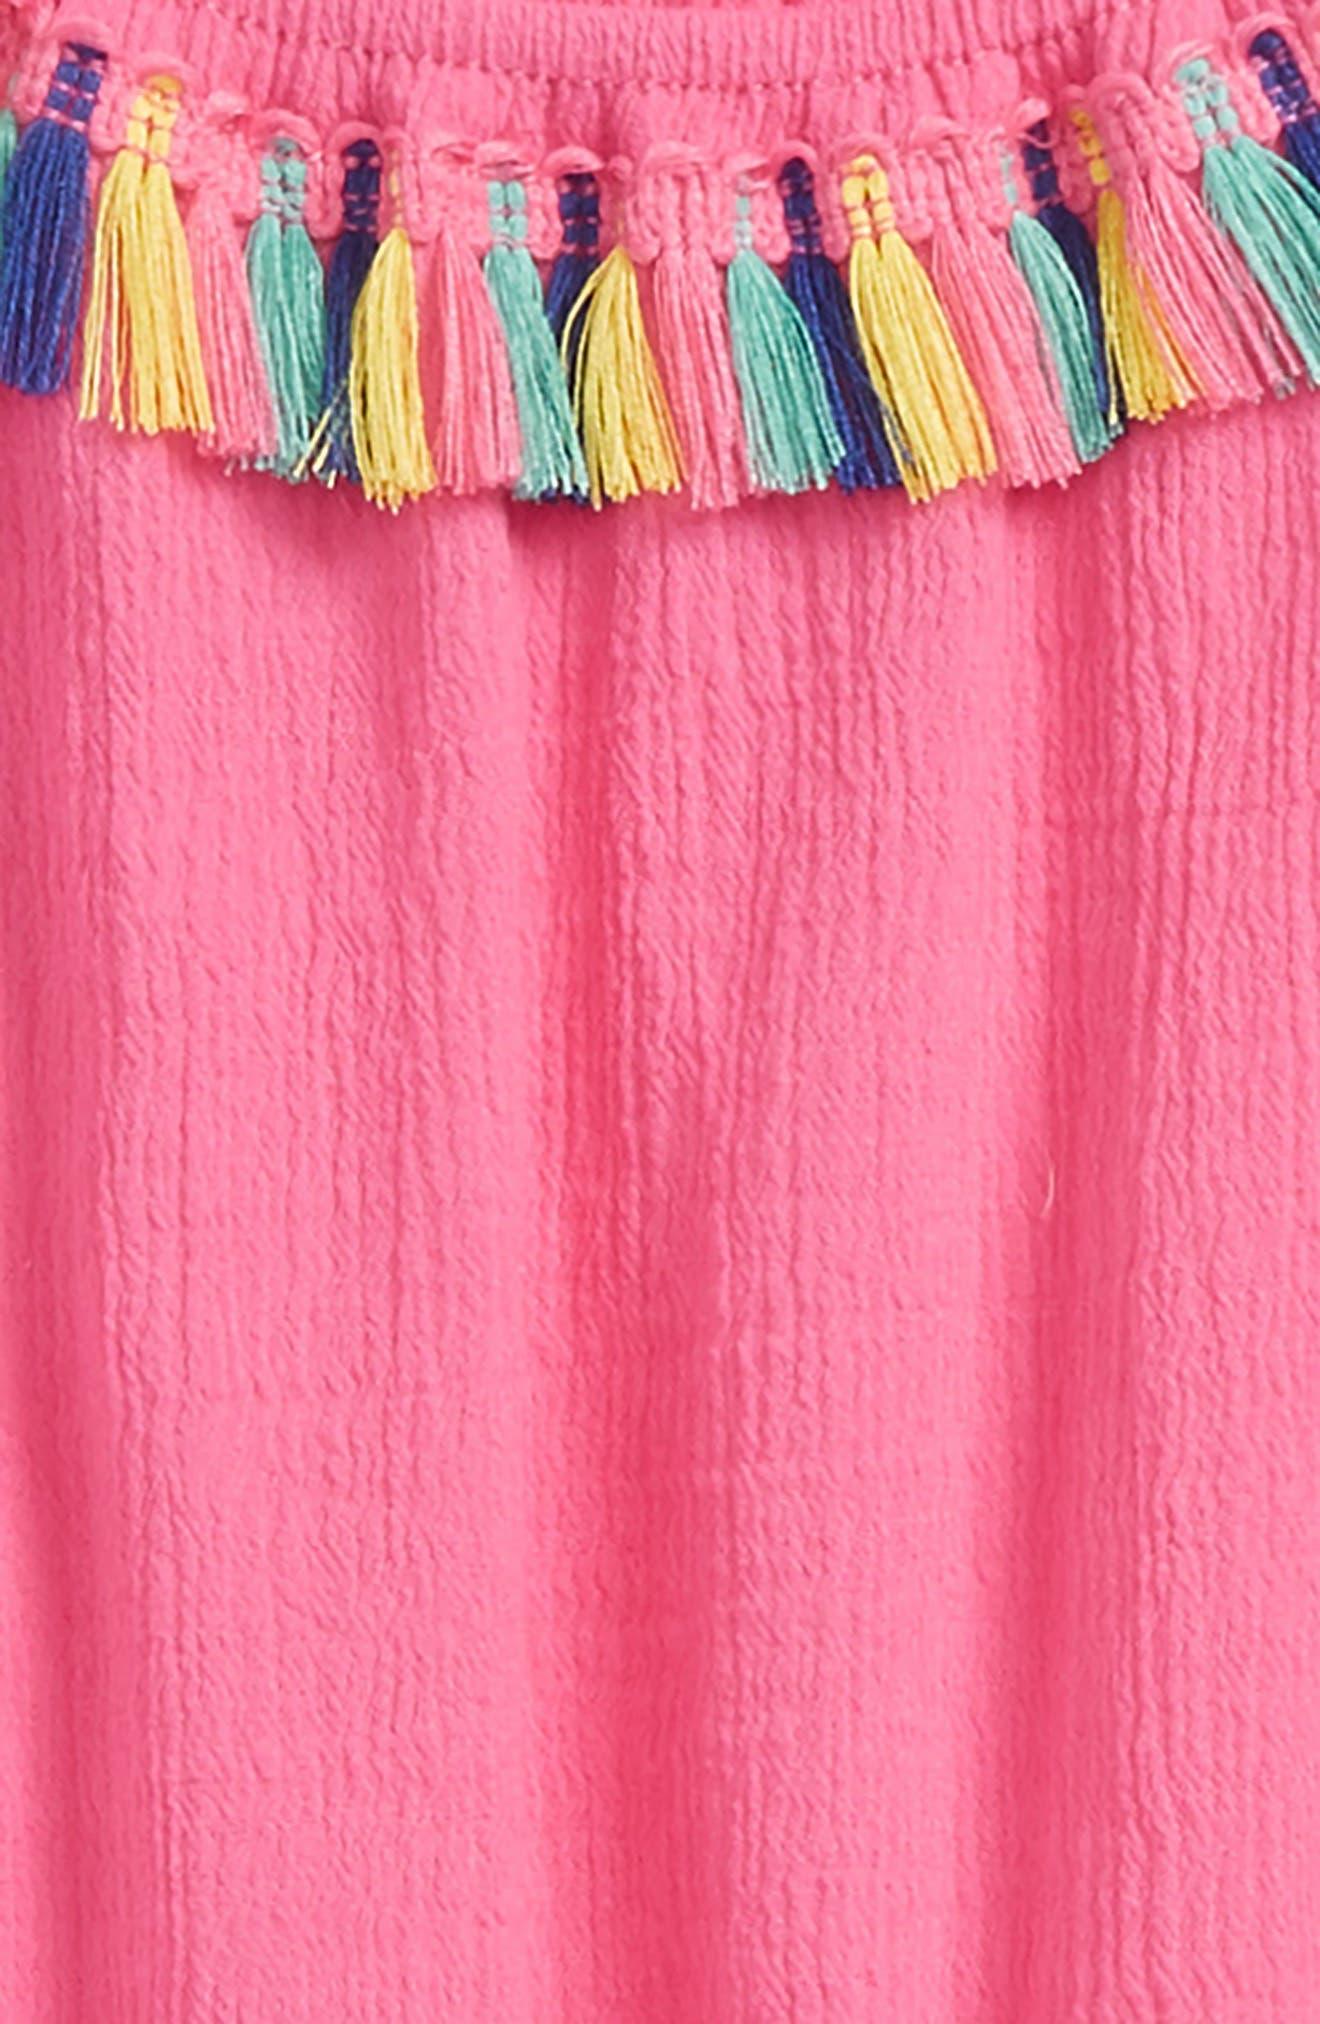 Rainbow Tassel Trim Cover-Up Dress,                             Alternate thumbnail 2, color,                             Hot Pink